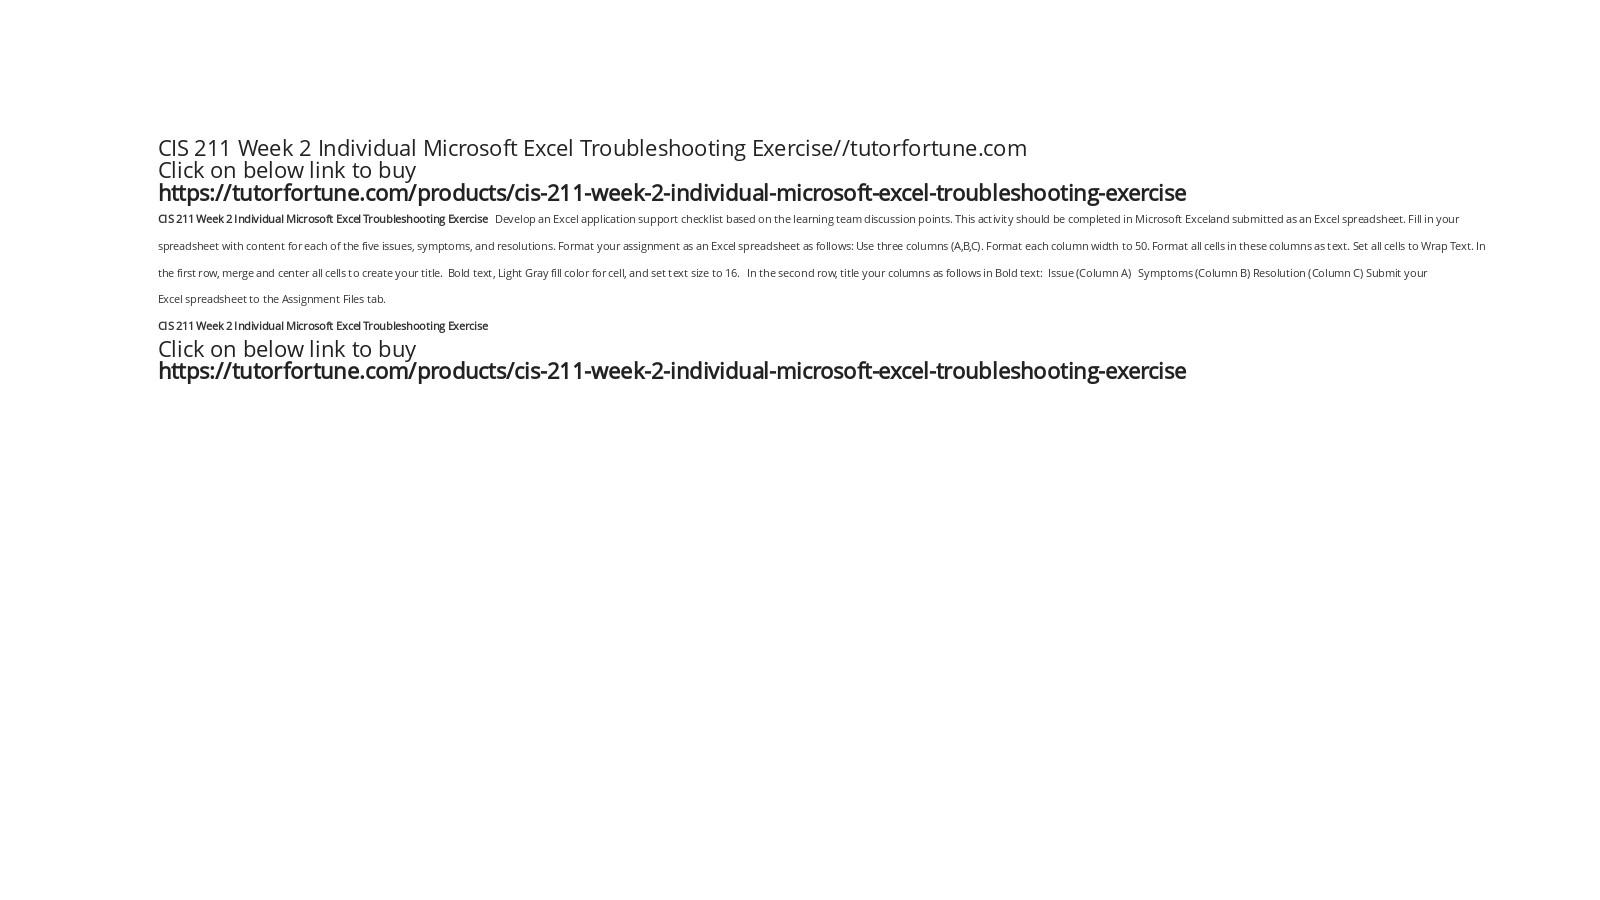 CIS 211 Week 2 Individual Microsoft Excel Troubleshooting Exercise